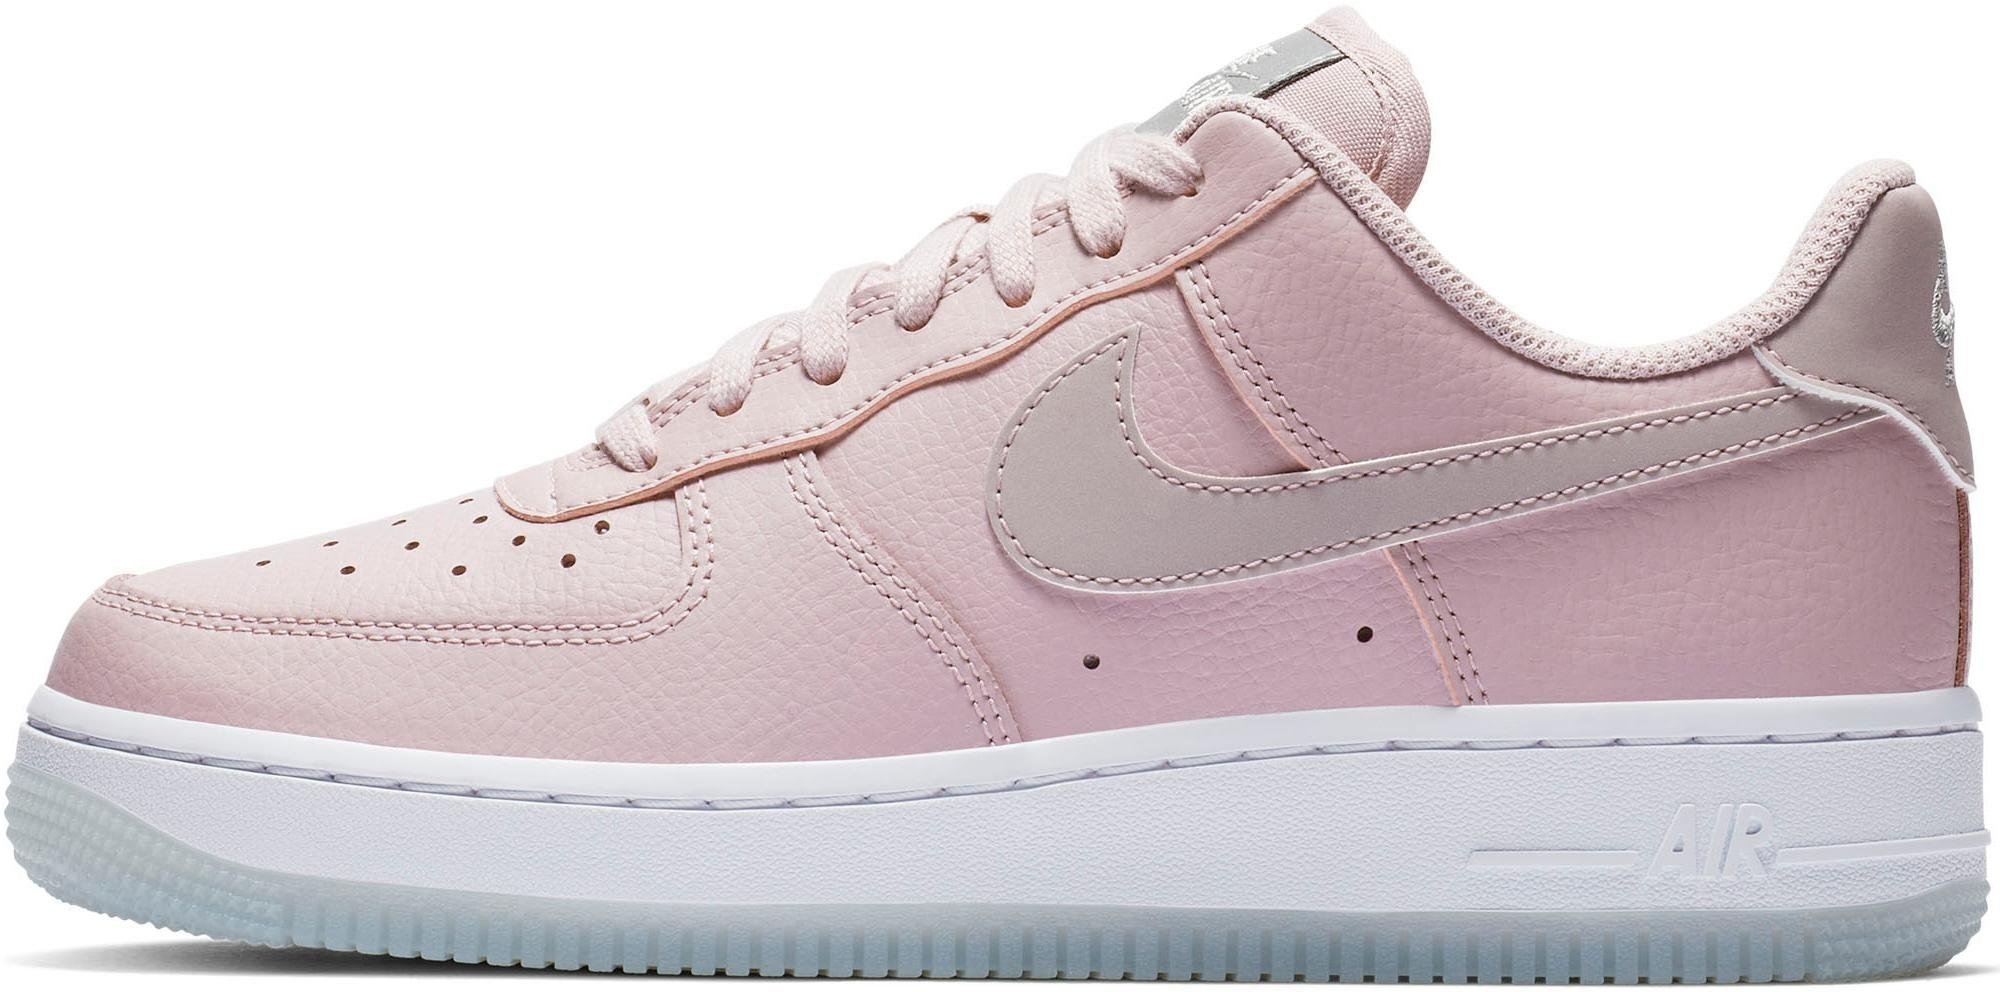 Sneakerswmns 1 Verkrijgbaar Nike Force Ess Sportswear Air Online '07 W29YHDIE